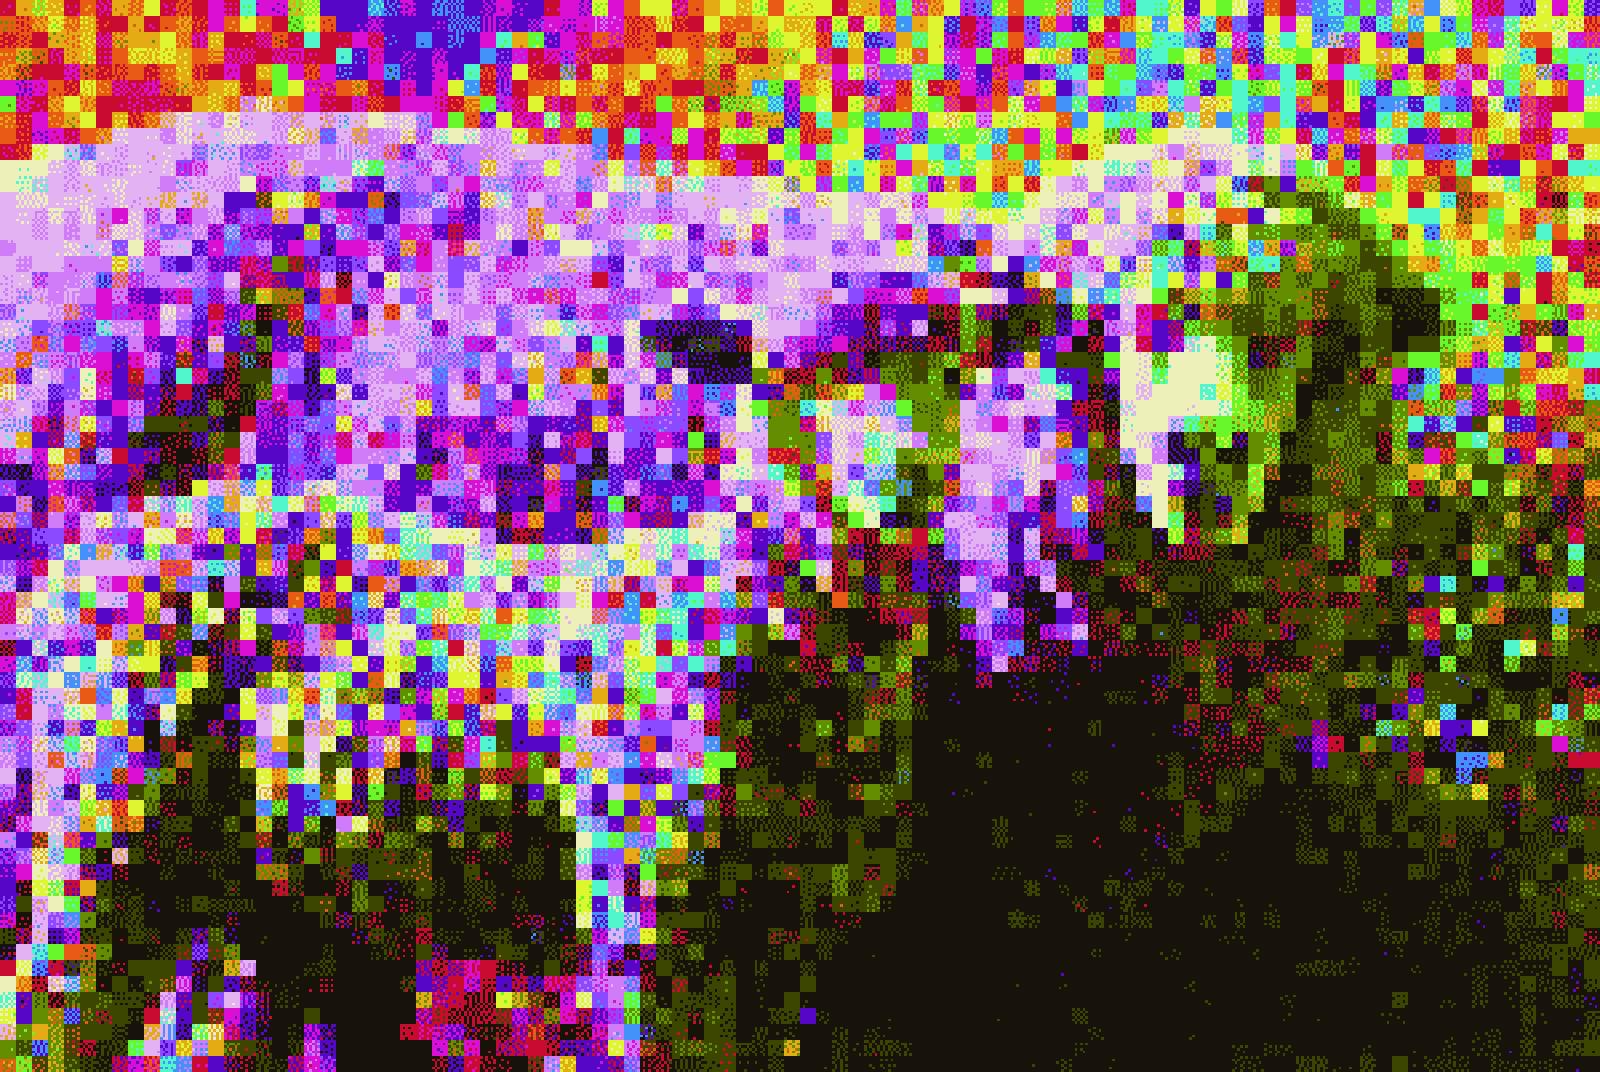 pixelschafe